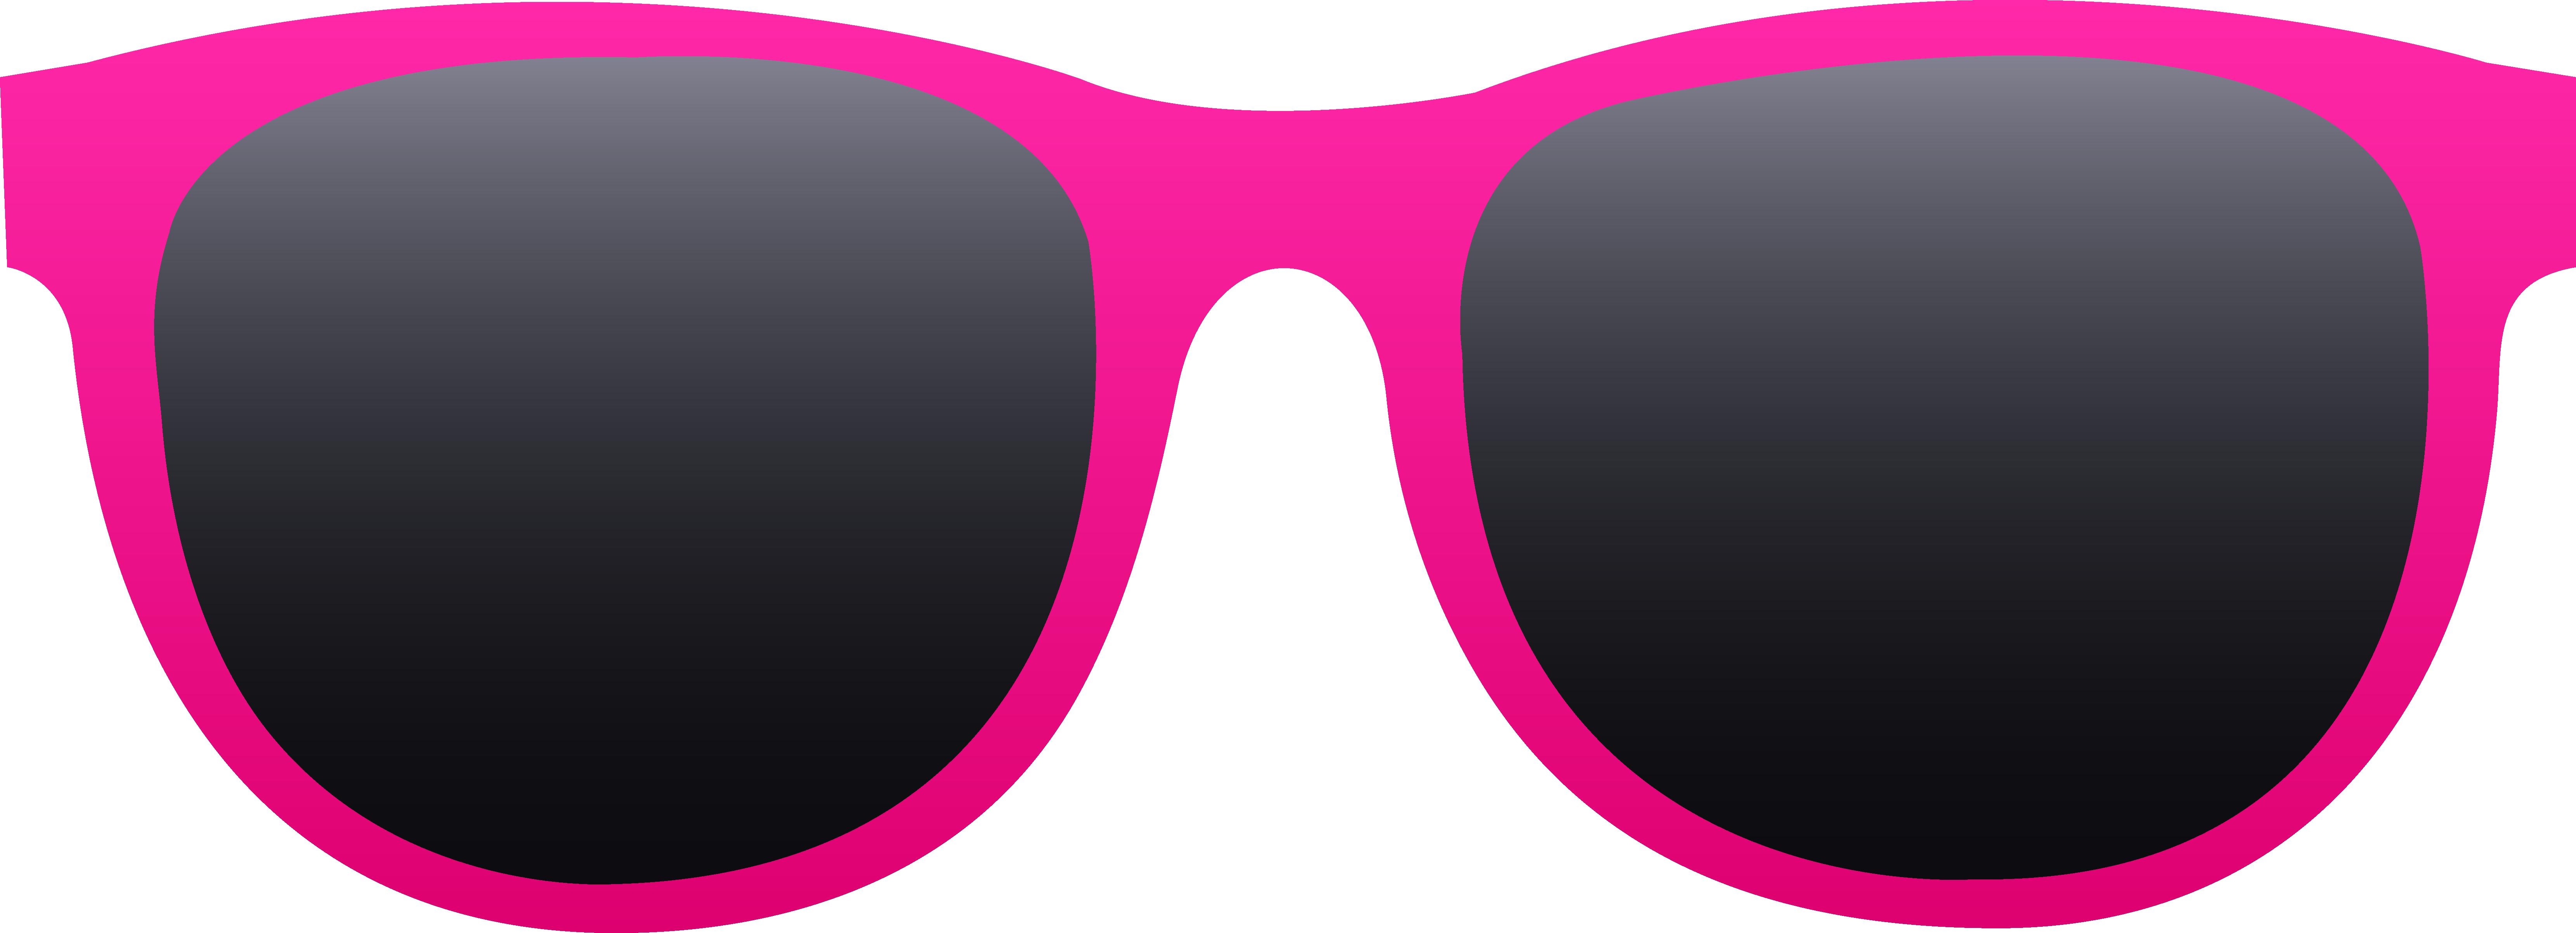 Sunglasses Clipart-sunglasses clipart-15